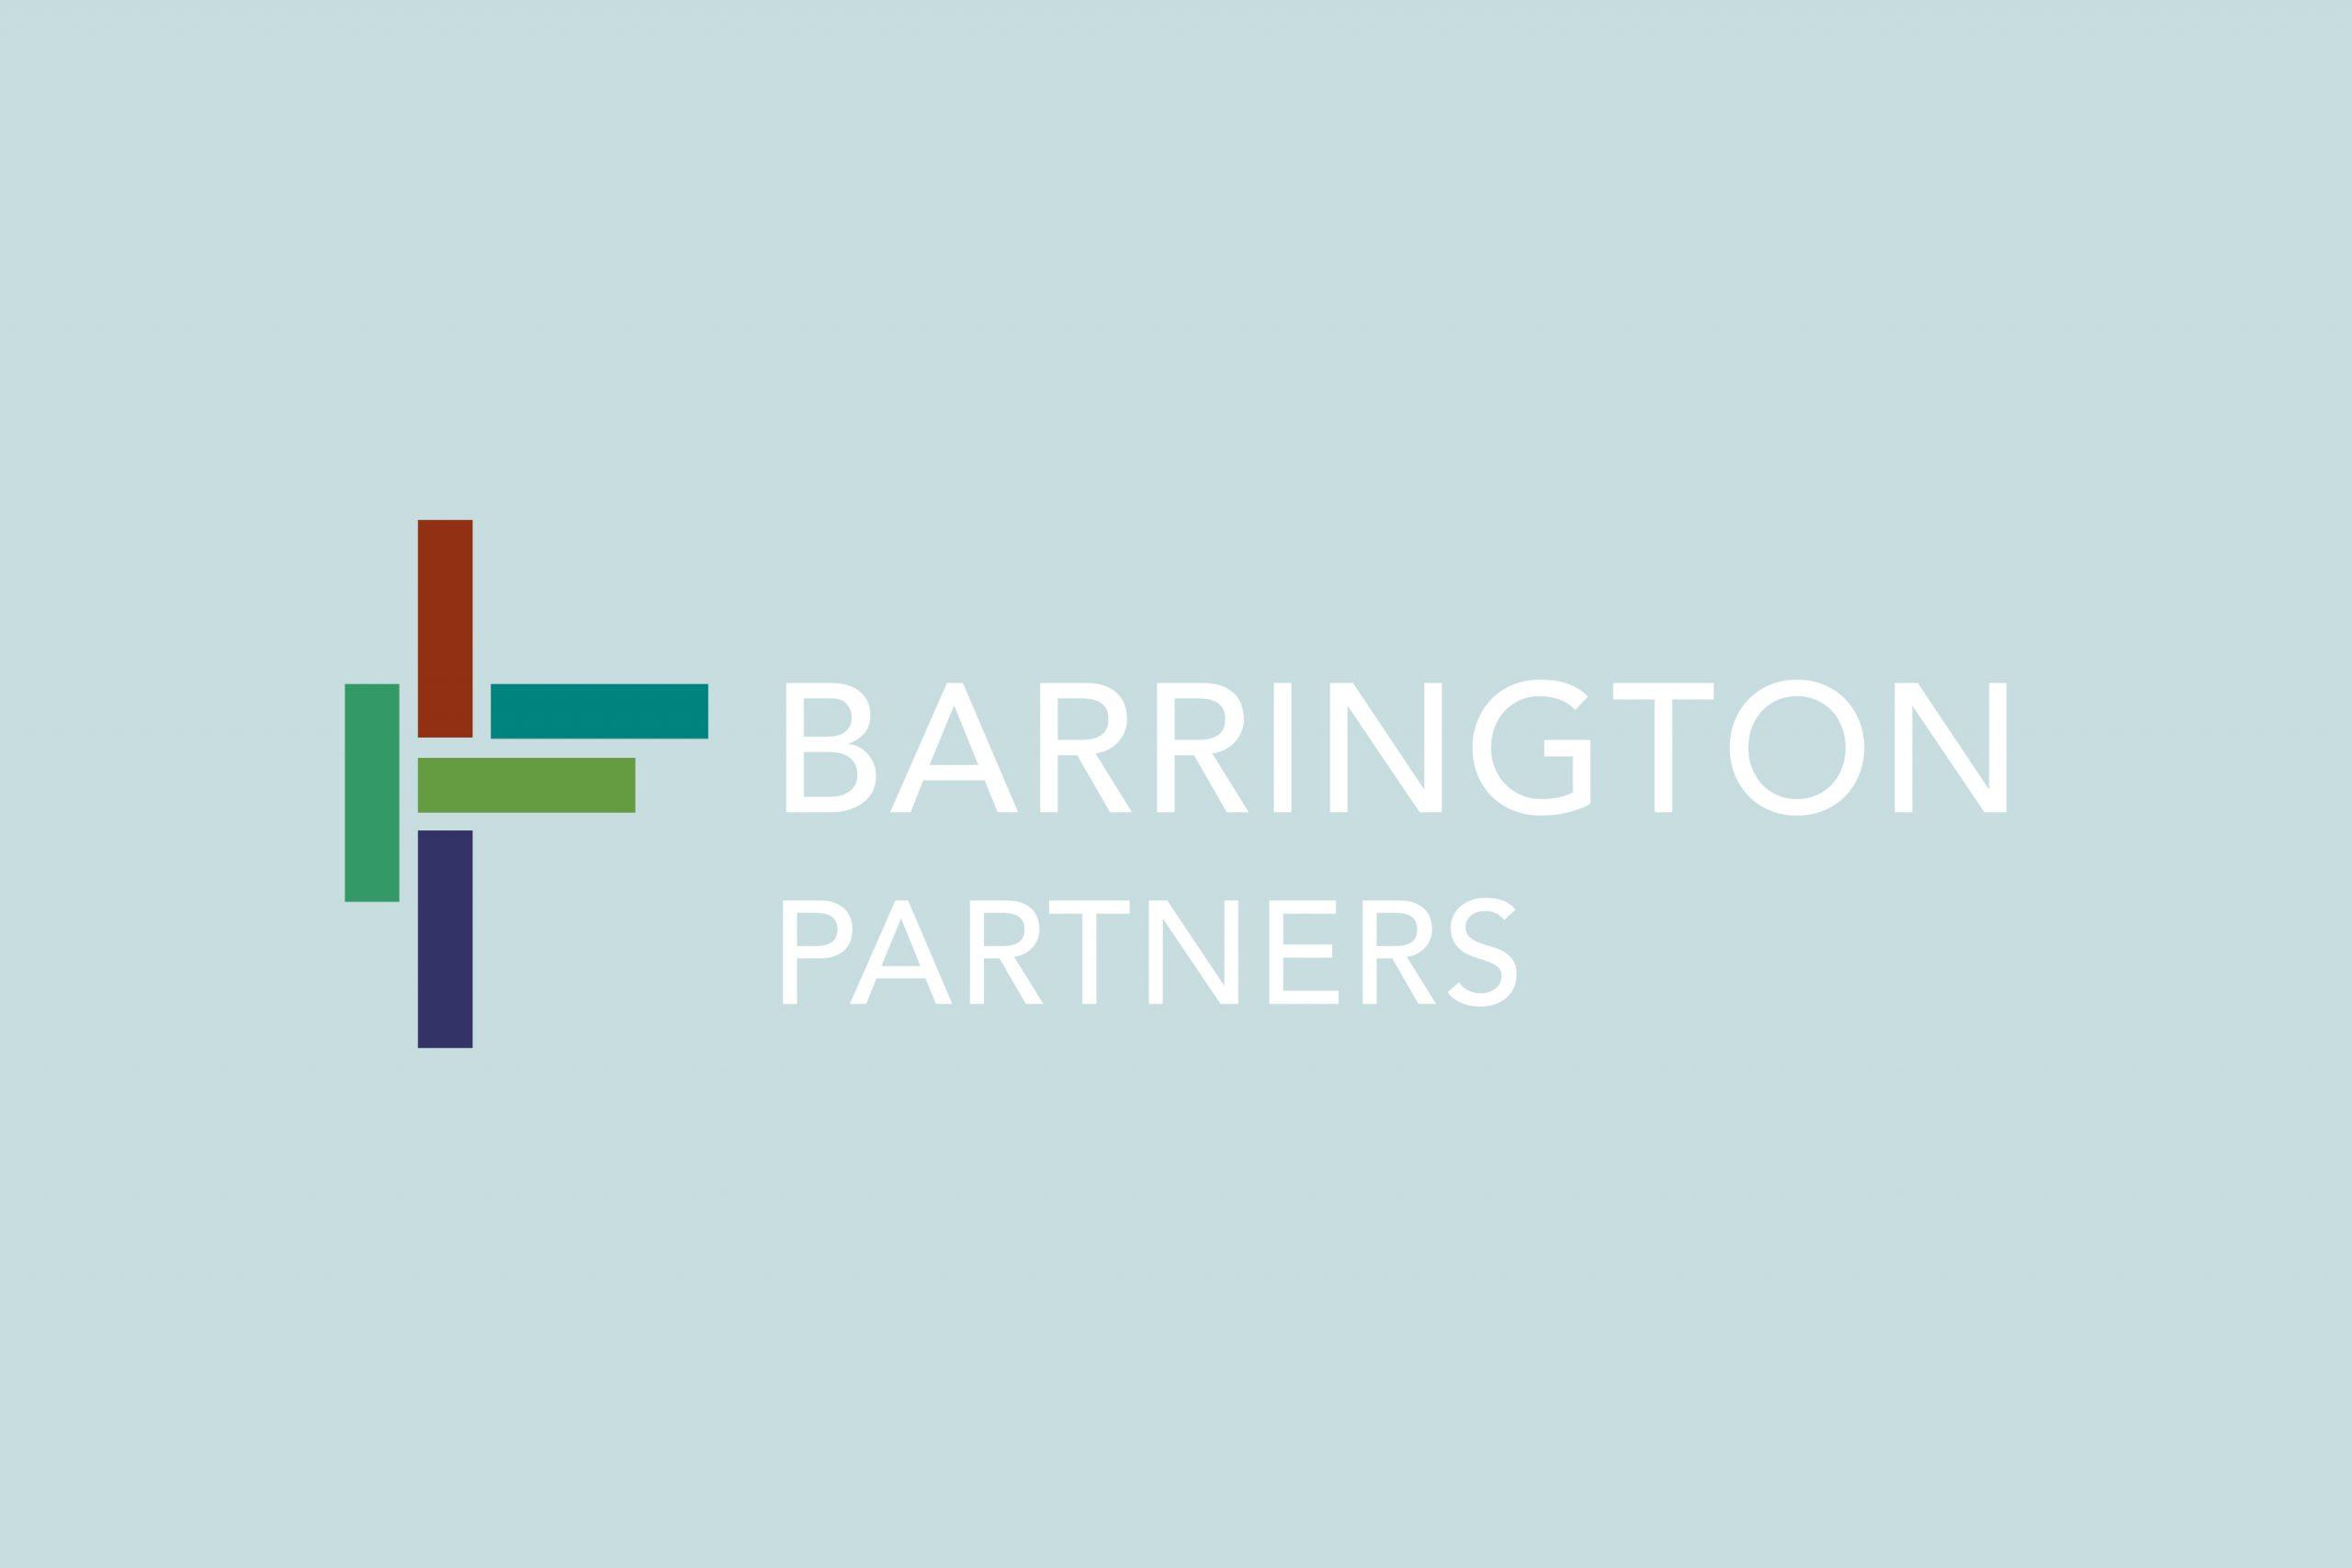 Nick Spanos, CPA, Partner at Barrington Partners